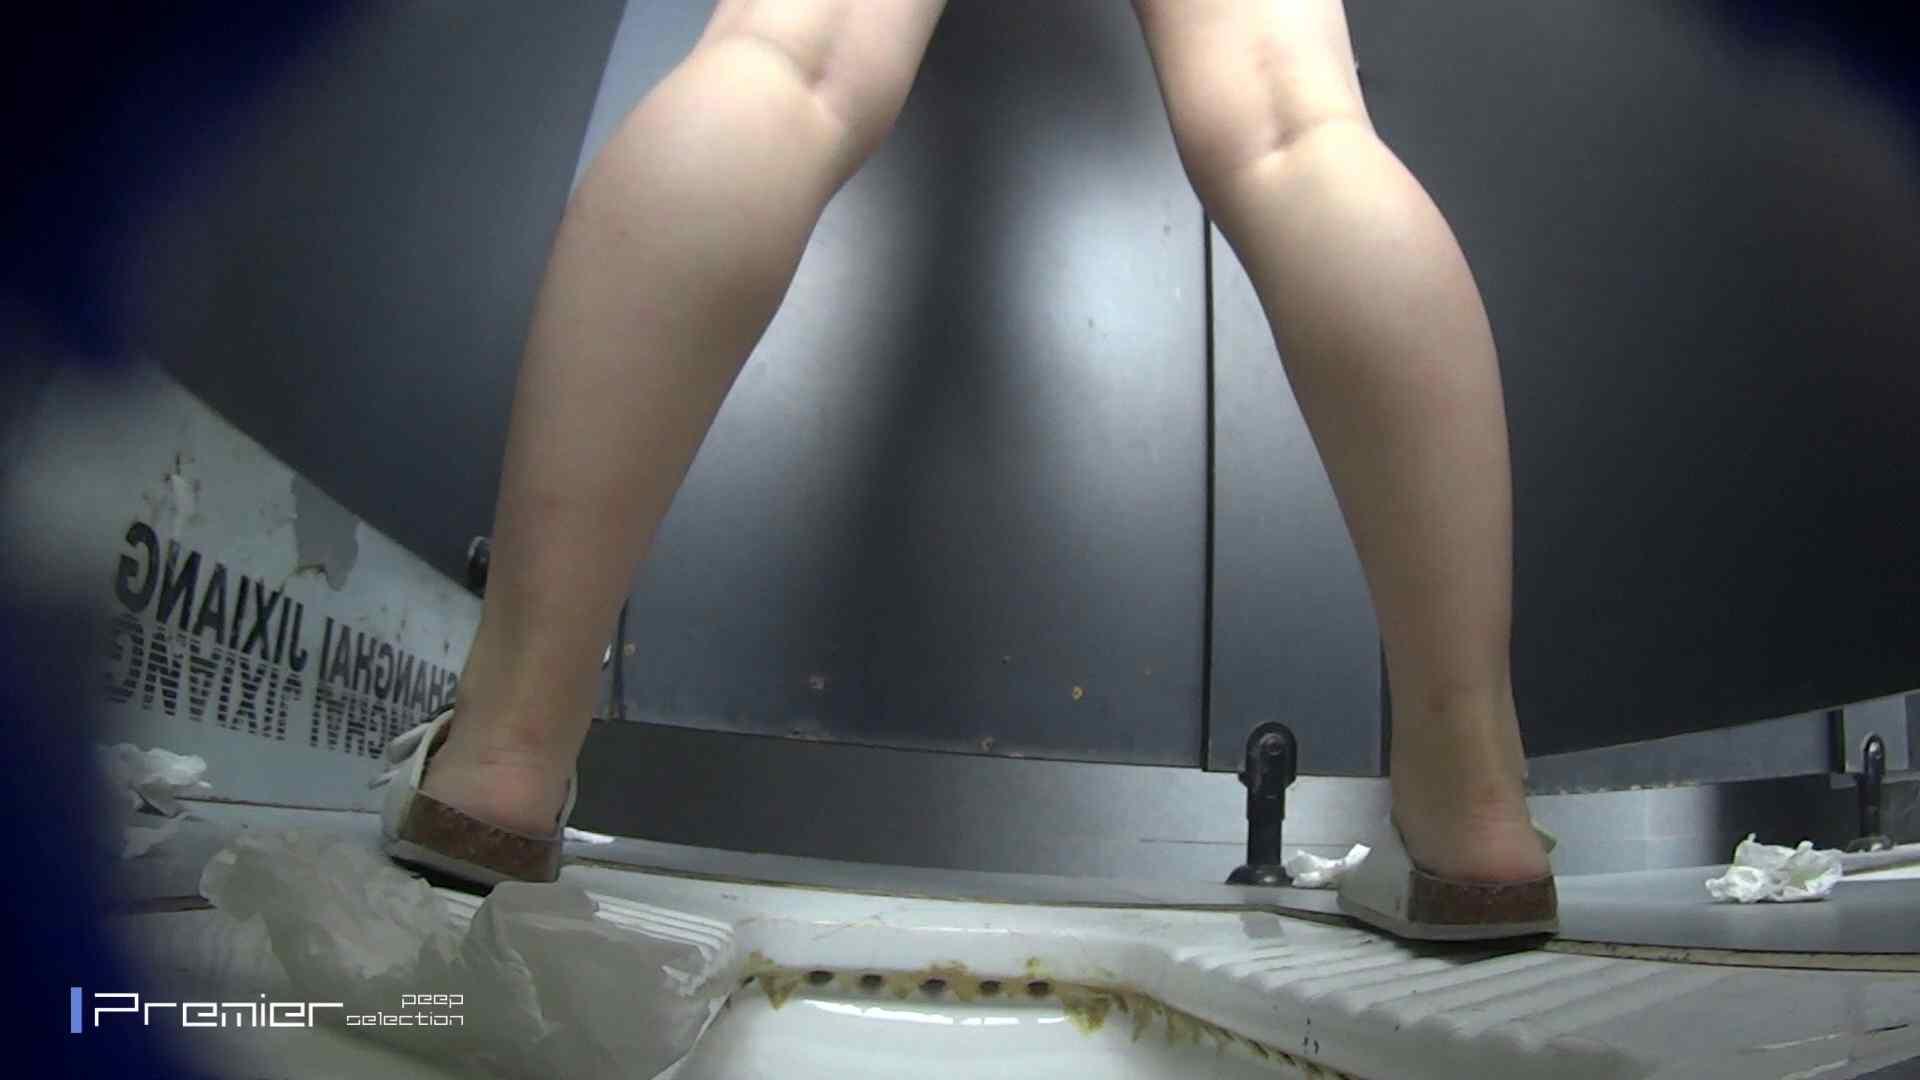 聖水ダラダラ色美女の洗面所 大学休憩時間の洗面所事情55 洗面所  55PIX 54